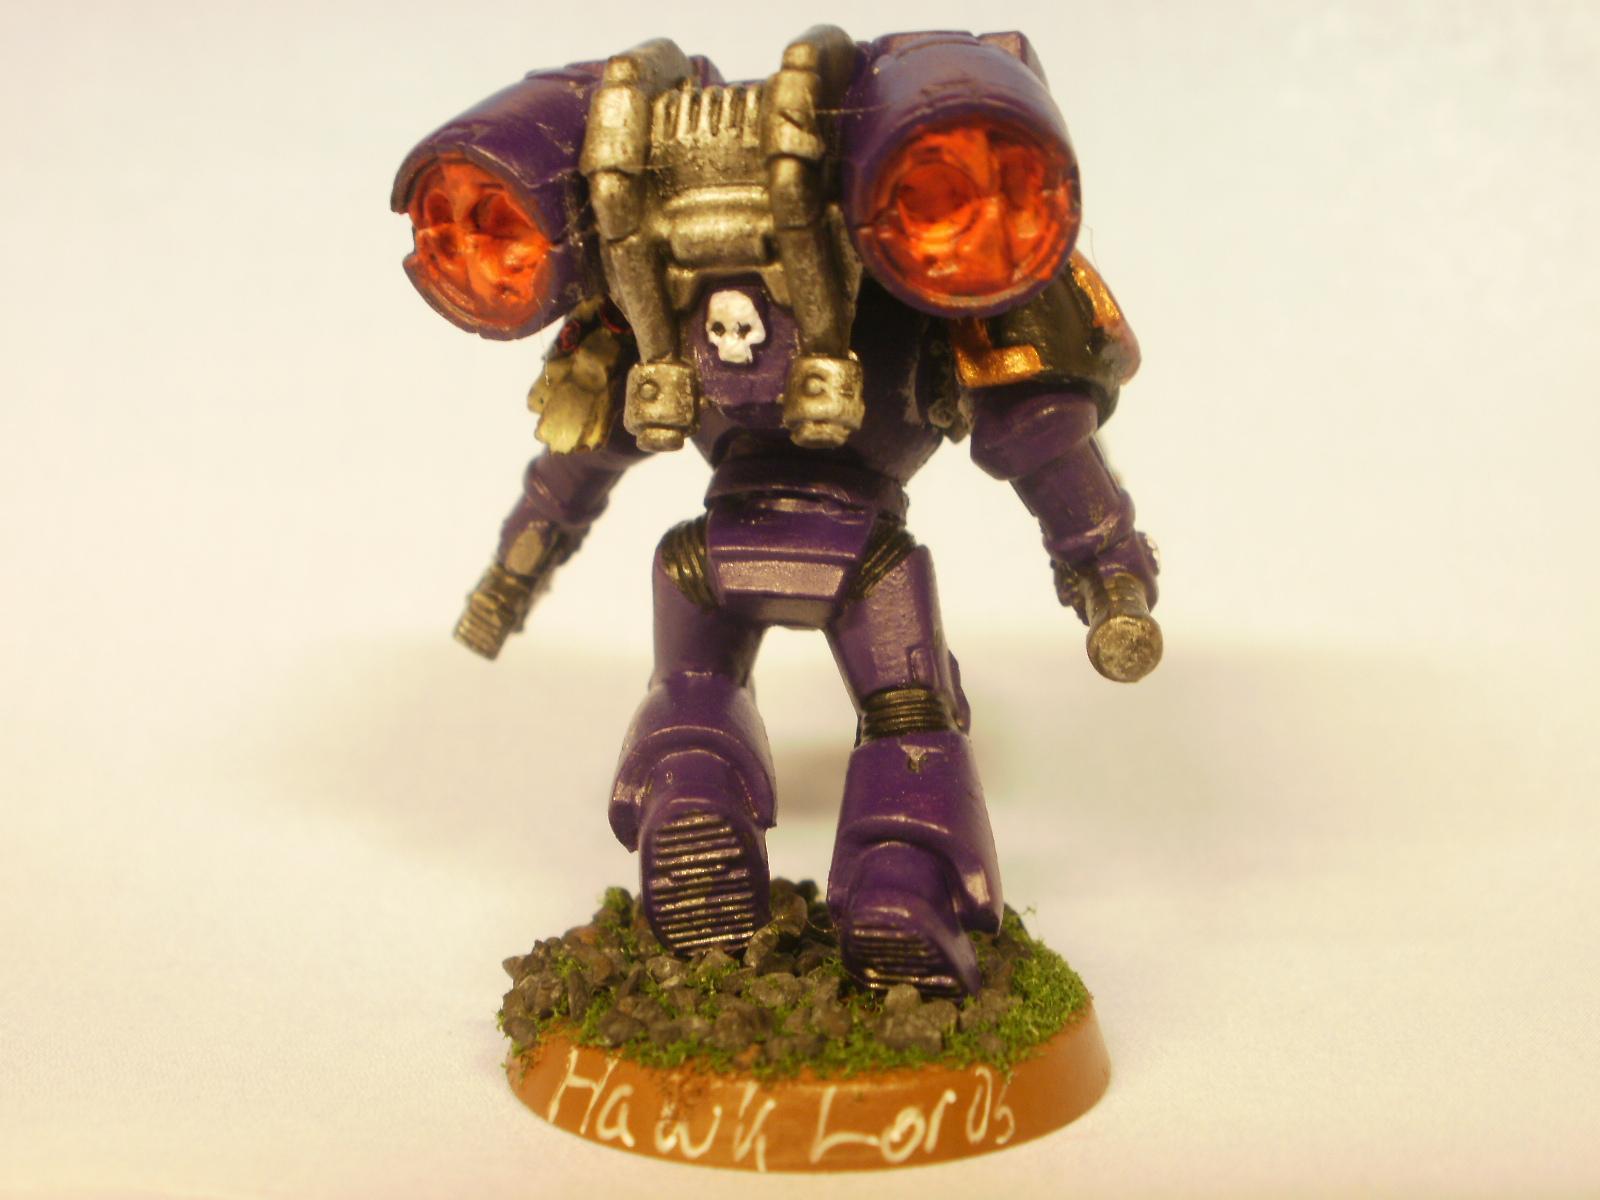 Hawk Lords - rear